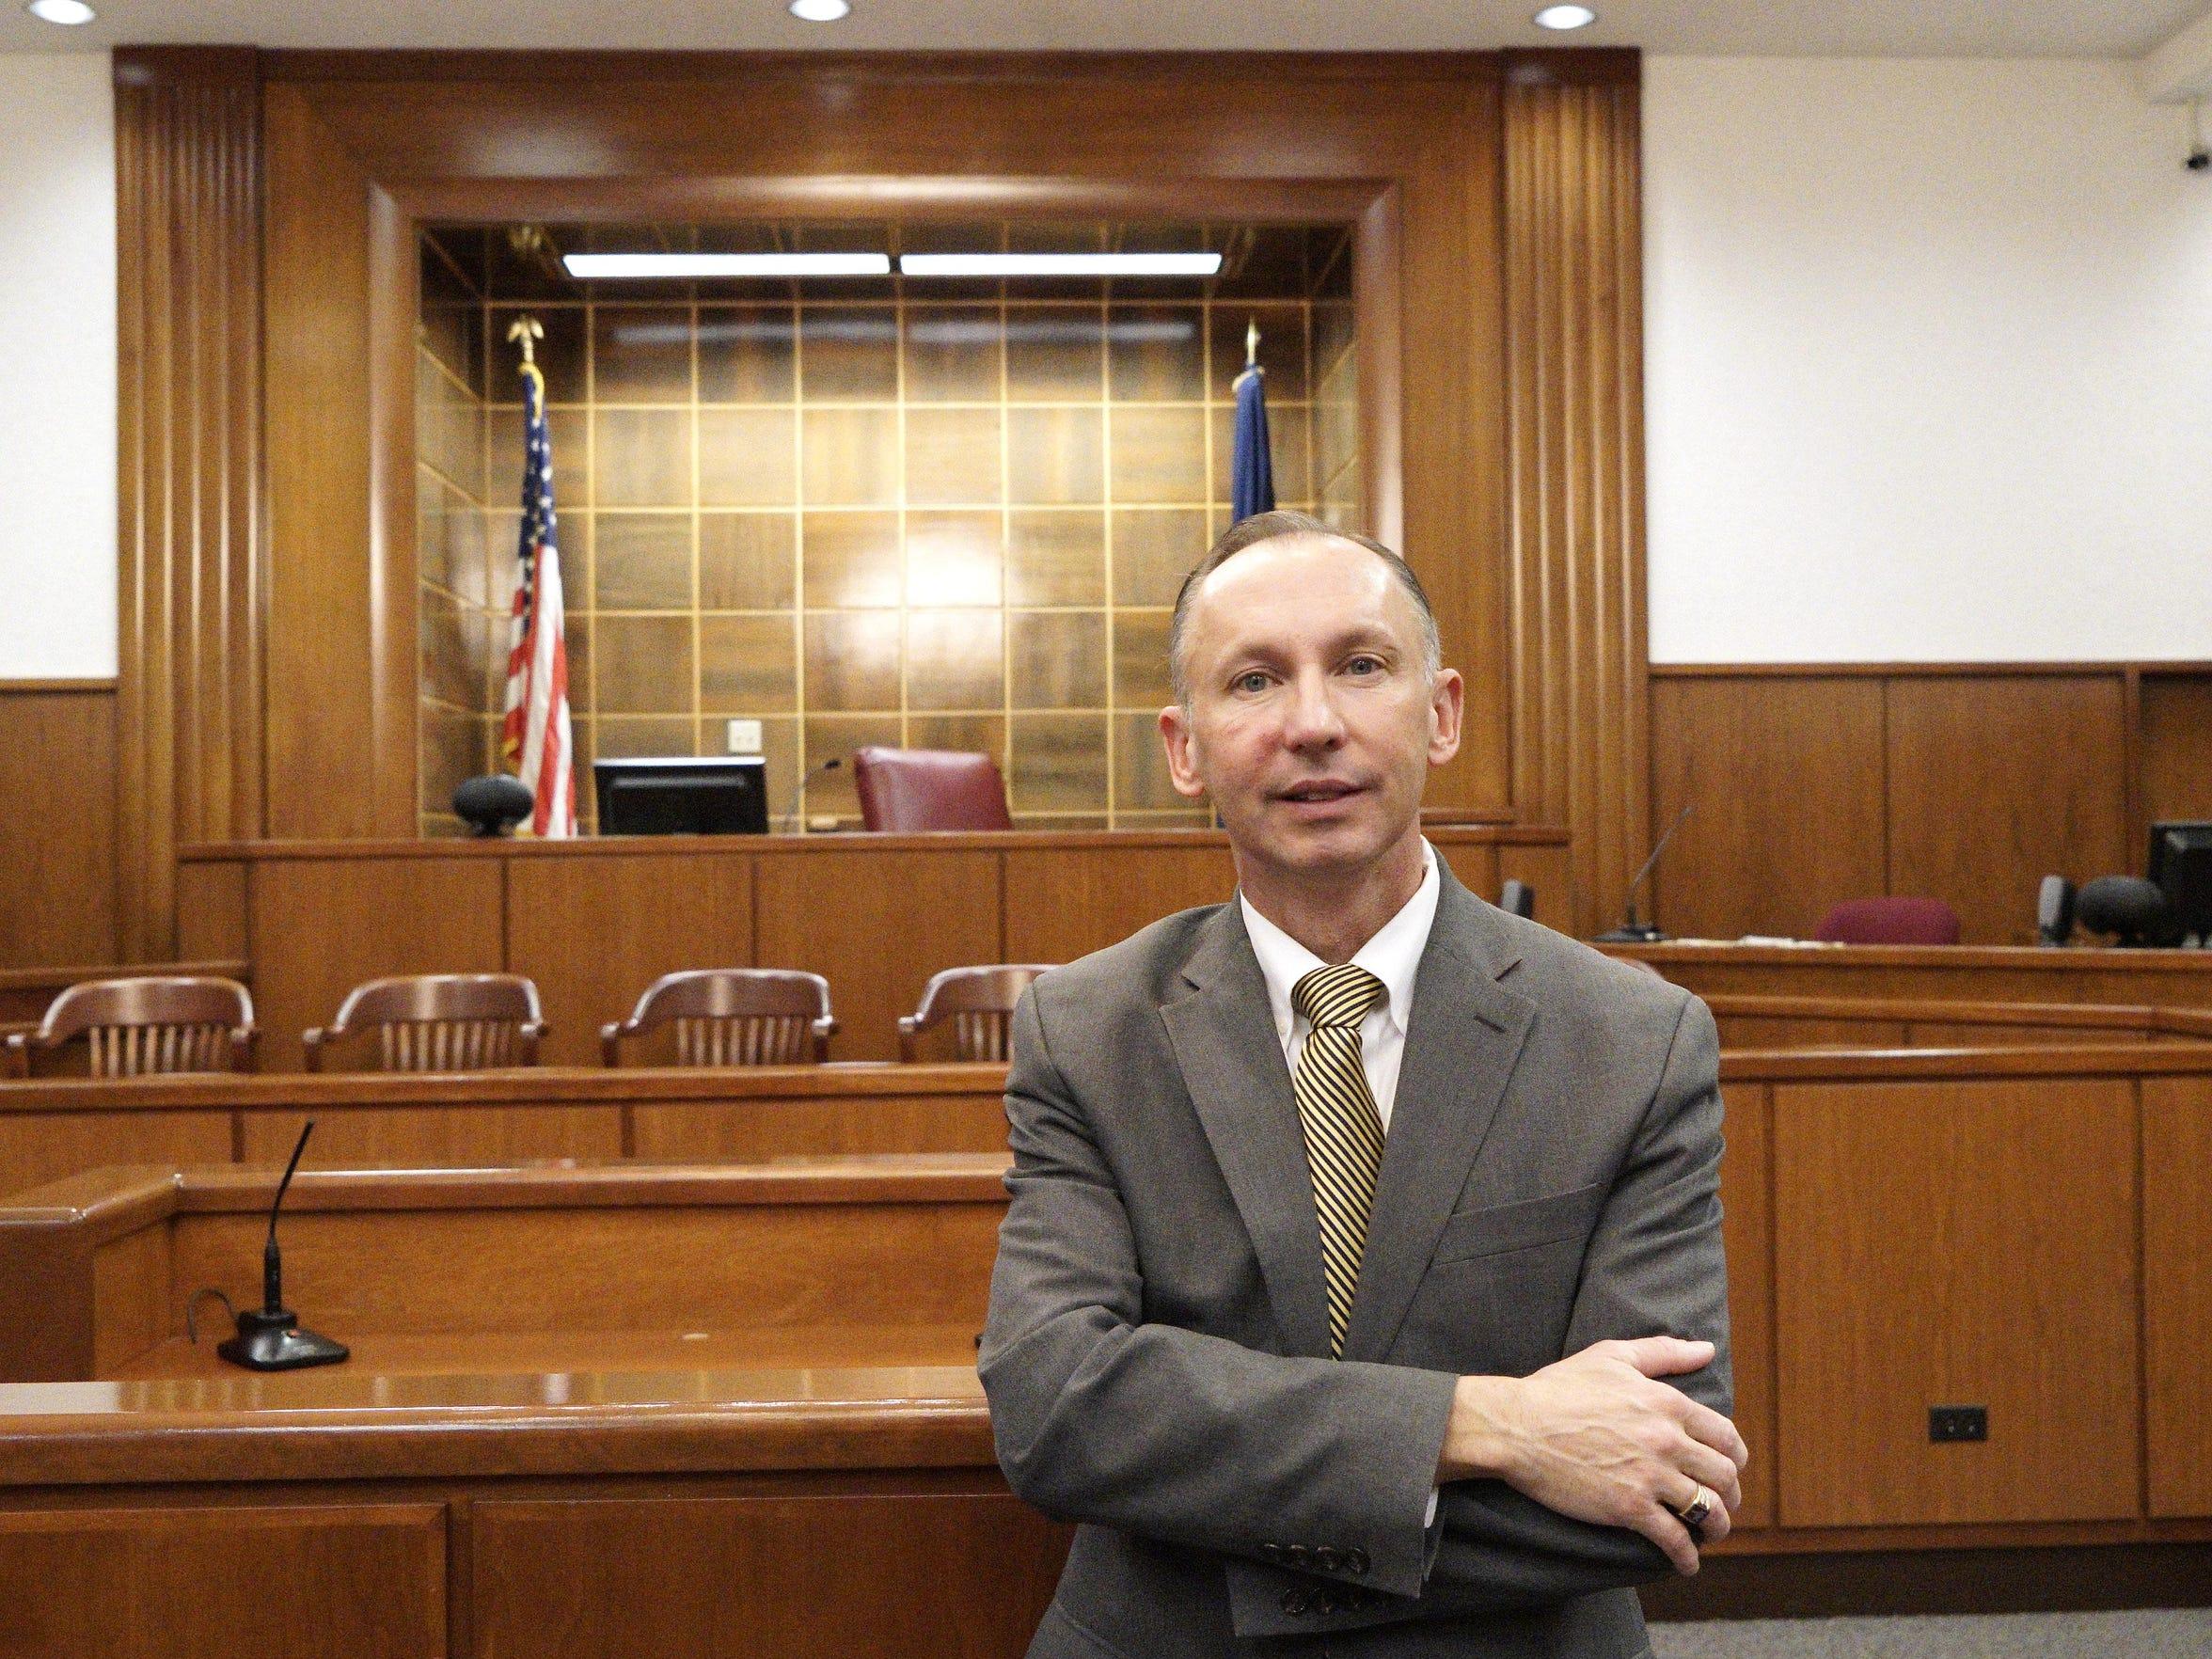 Commonwealth's Attorney David Ledbetter